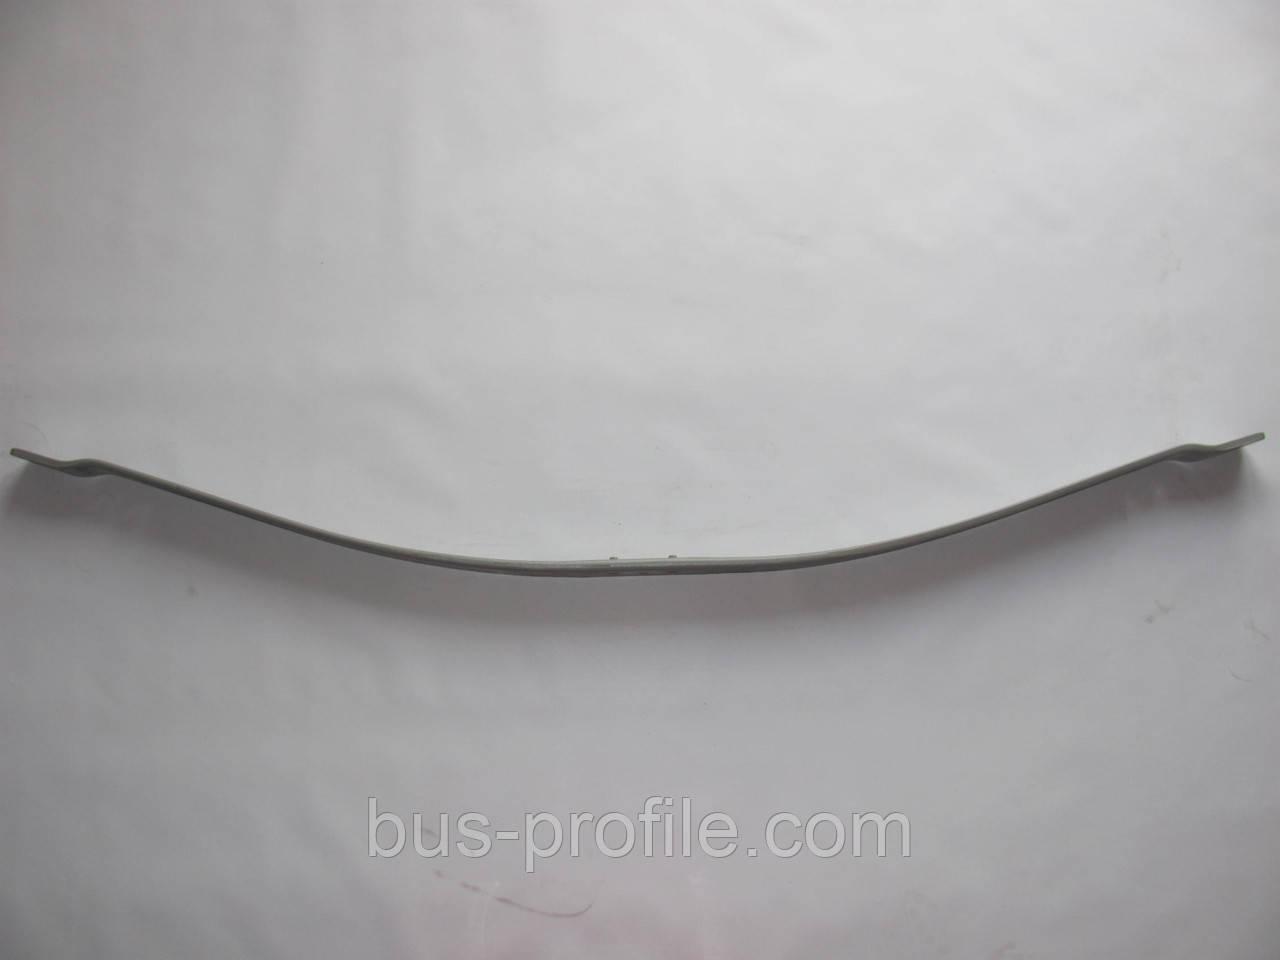 Подкоренной лист (усиленный) – SVENSSON – на MB SPRINTER 408-416 (СПАРКА), VW LT-46  1996-2006 – F020T680ZA30